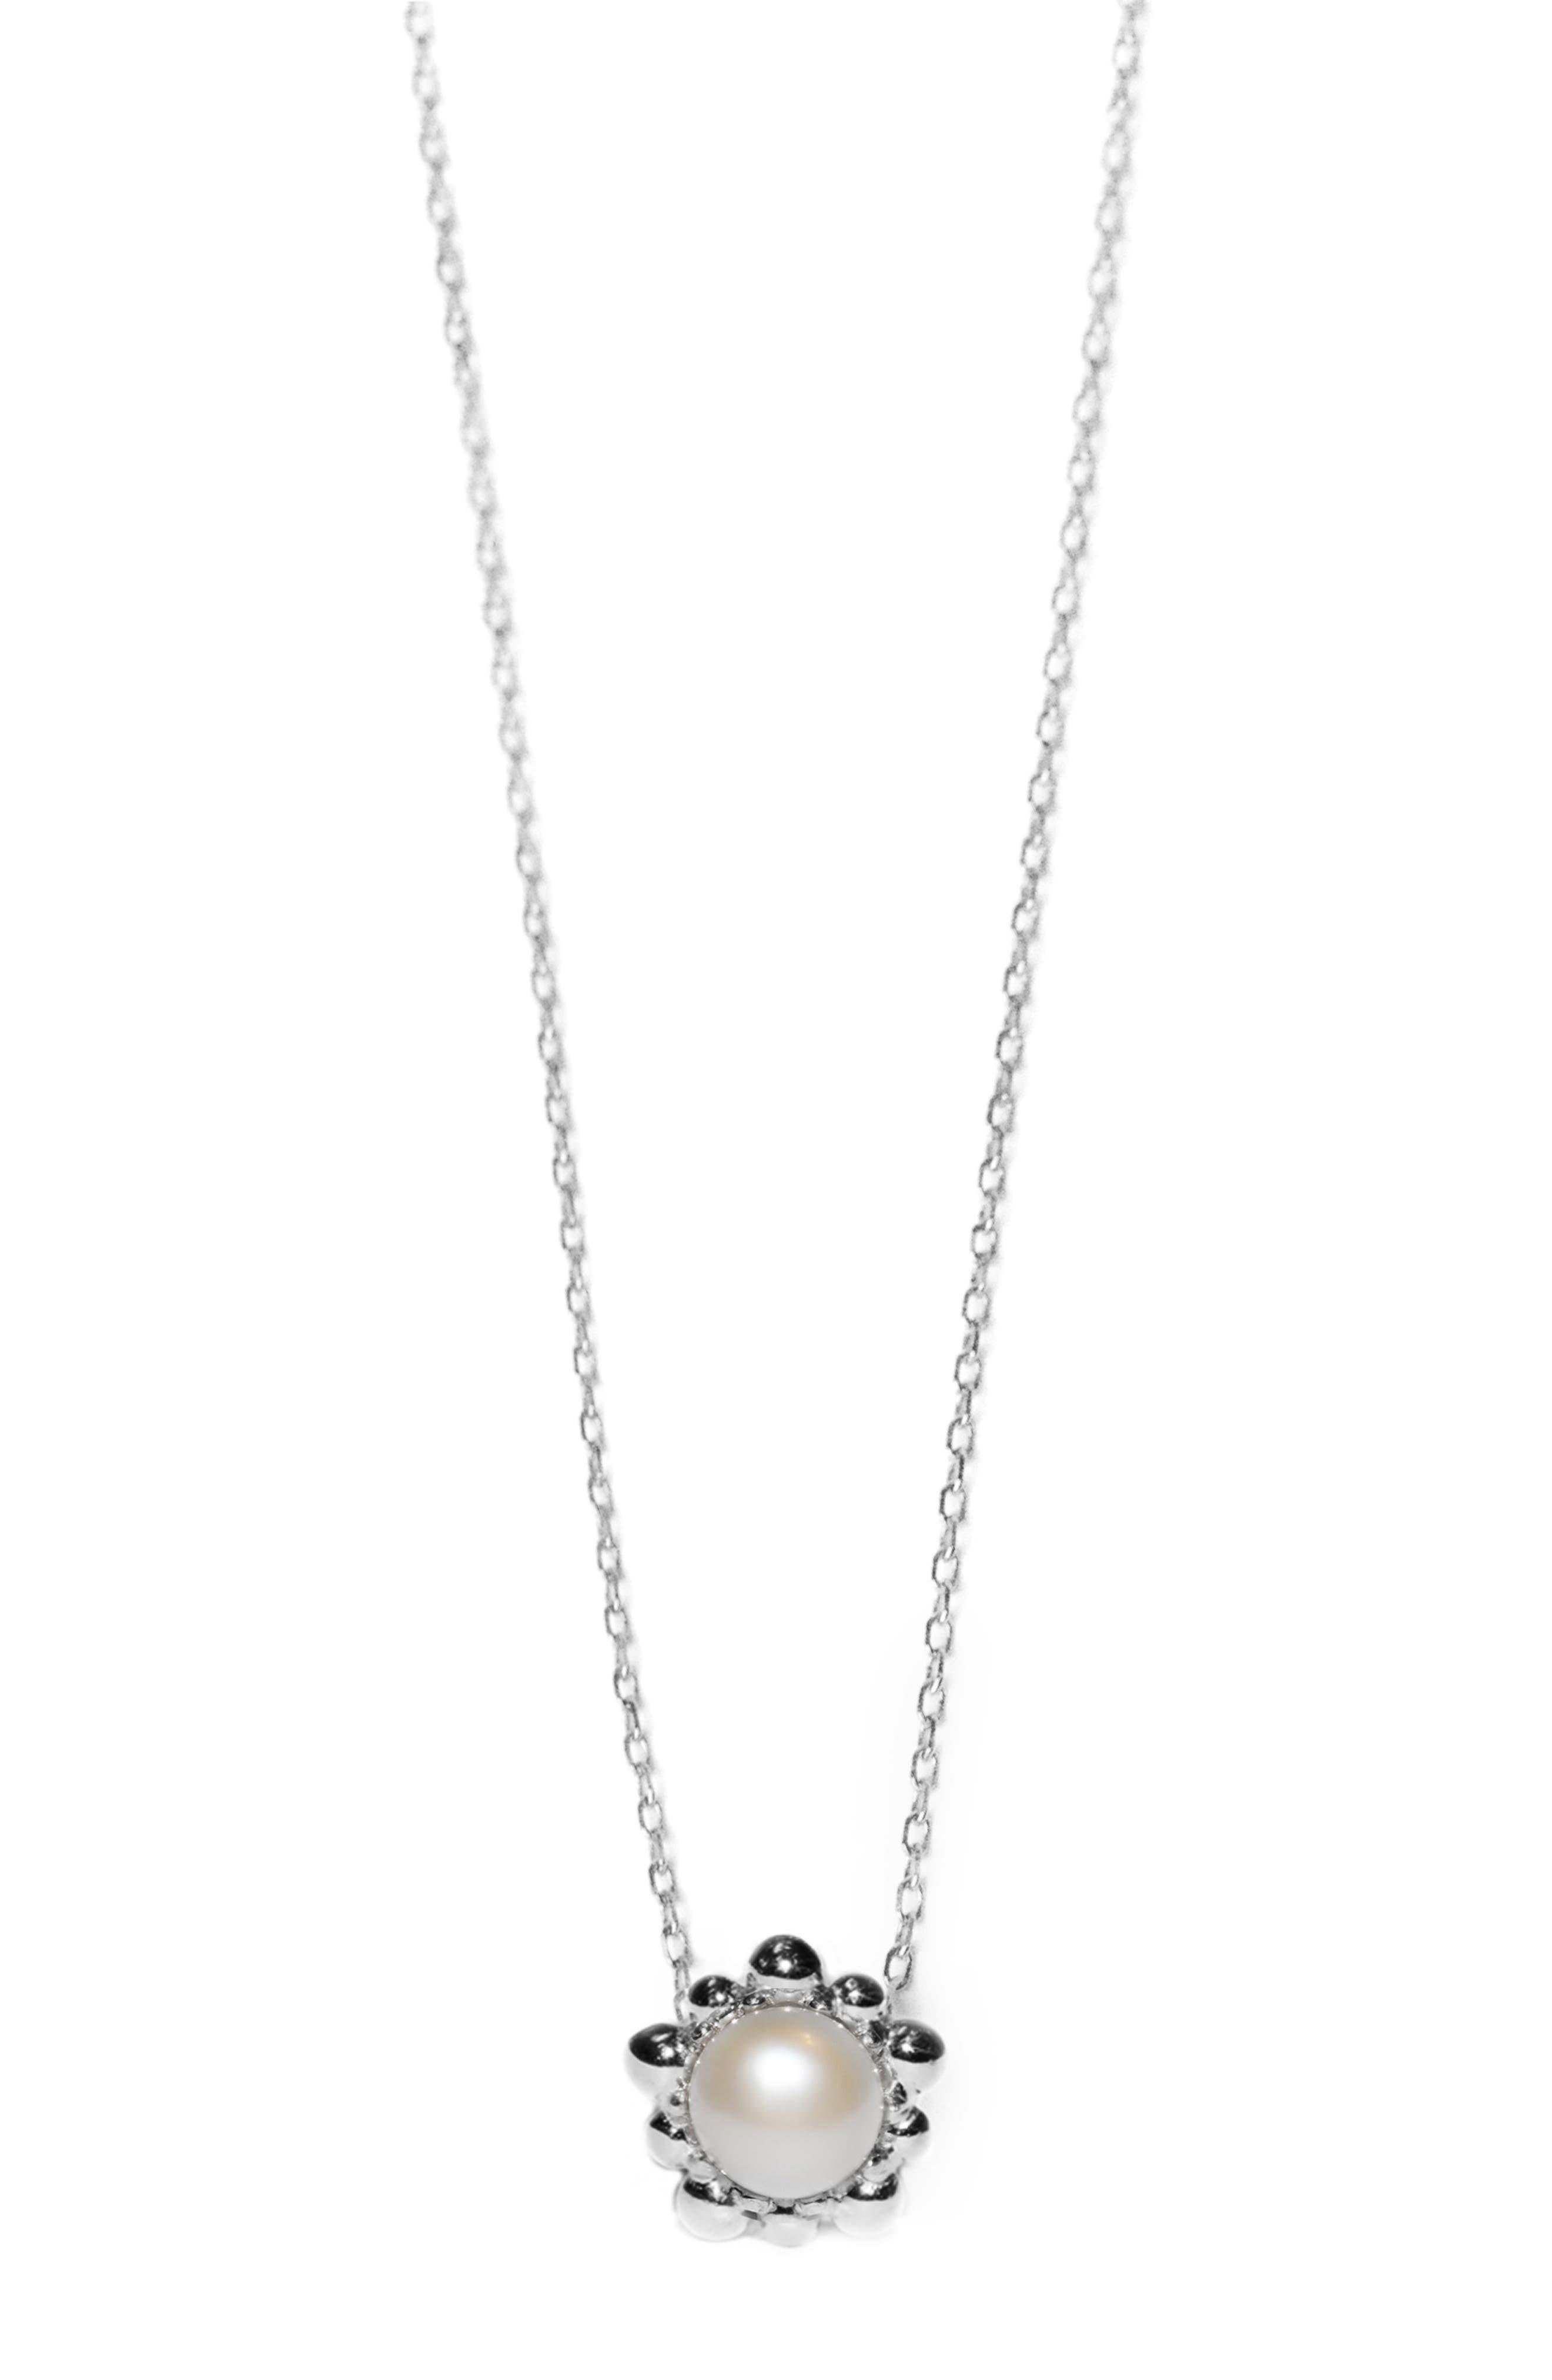 Dew Drop Pearl Pendant Necklace